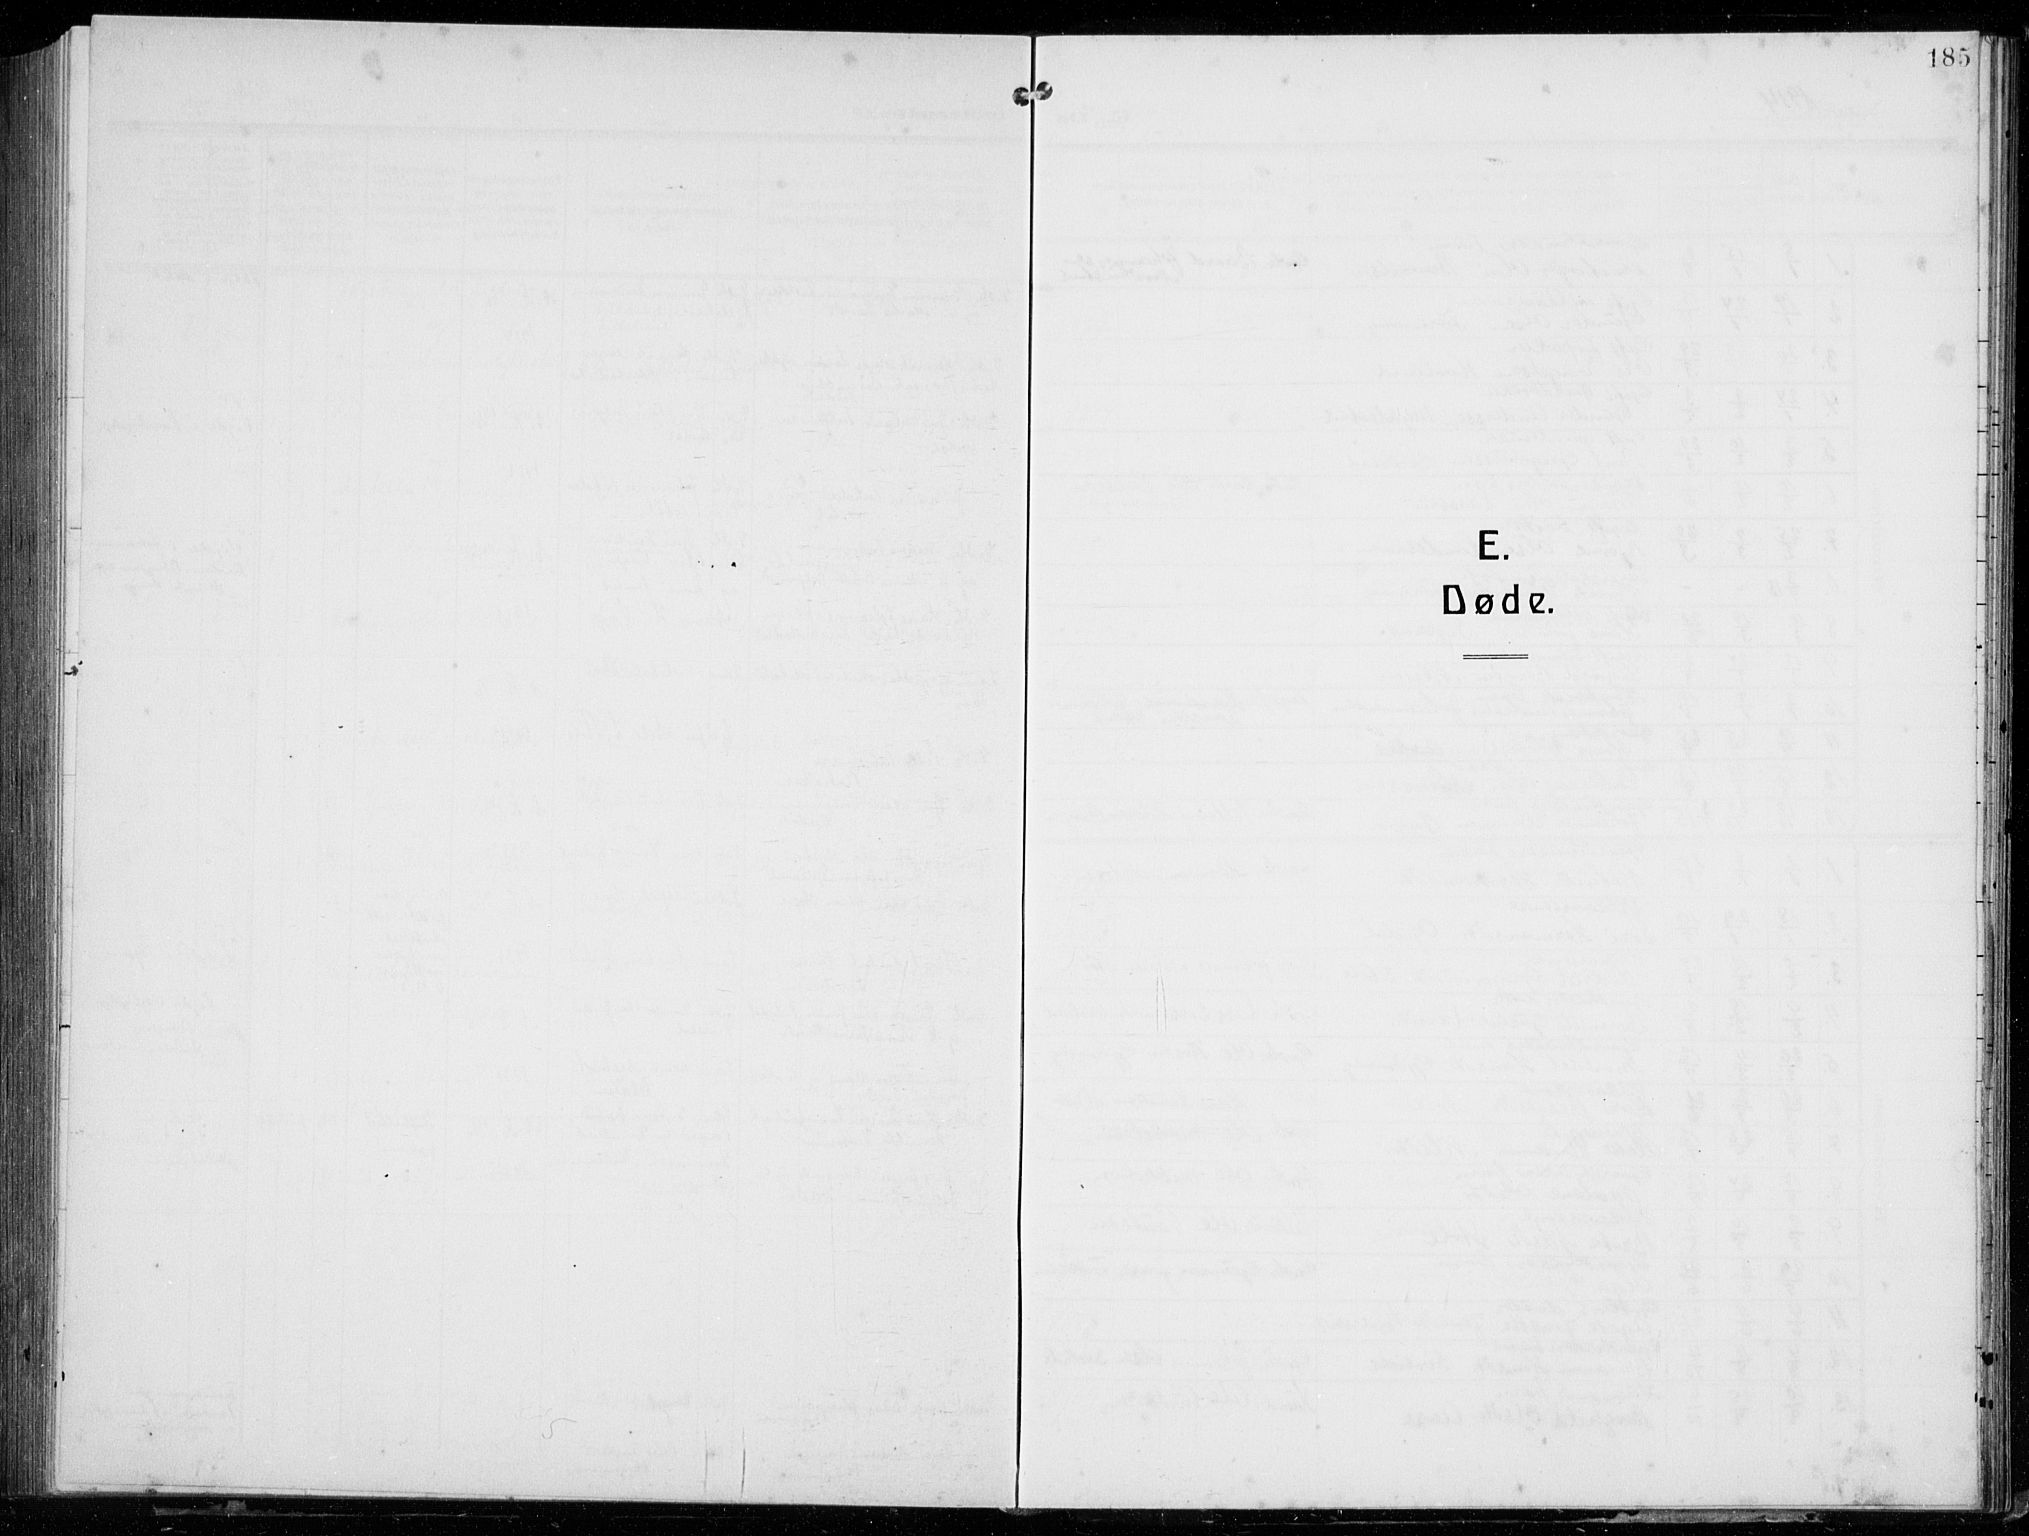 SAB, Tysnes Sokneprestembete, H/Hab: Klokkerbok nr. E  4, 1912-1936, s. 185